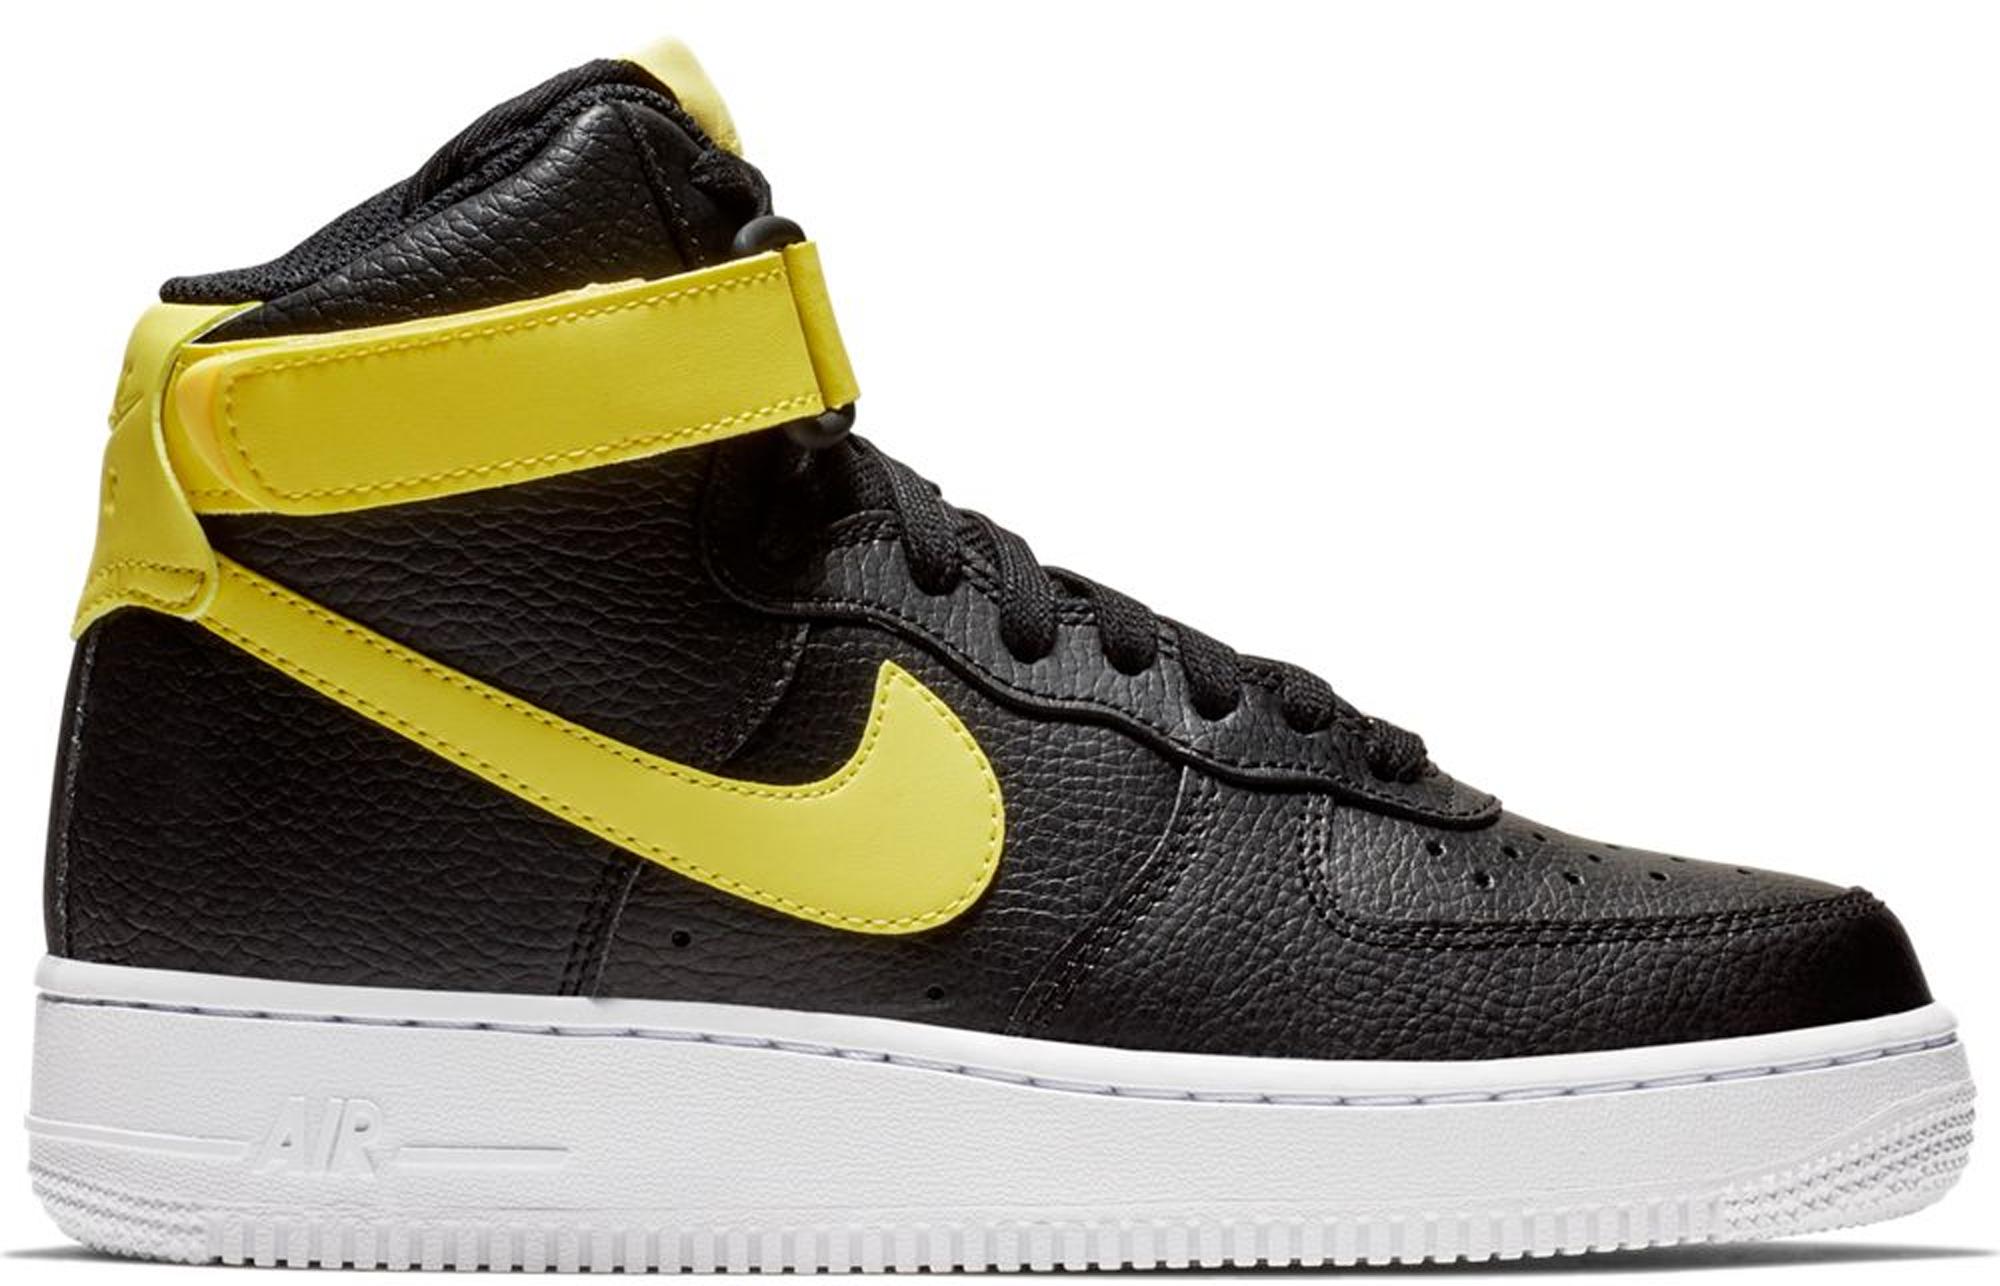 Nike Air Force 1 High Black Yellow